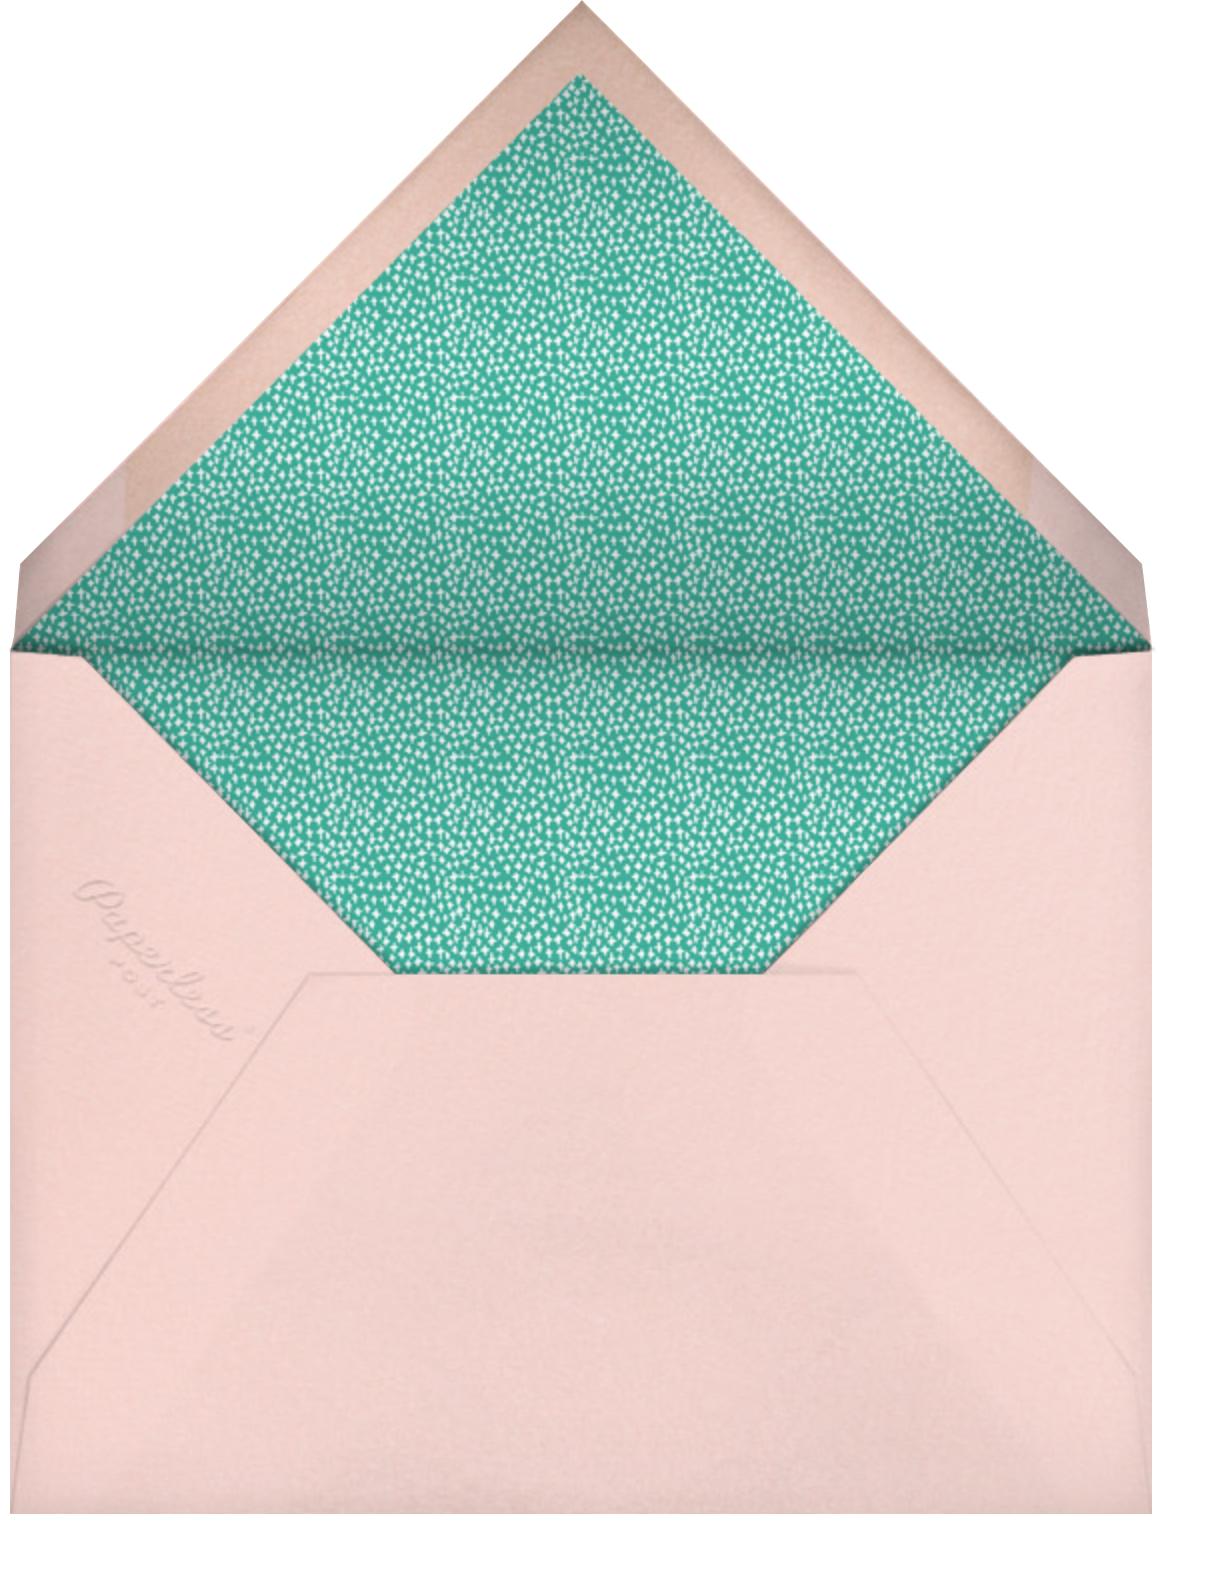 Doing Vine - Mr. Boddington's Studio - Envelope